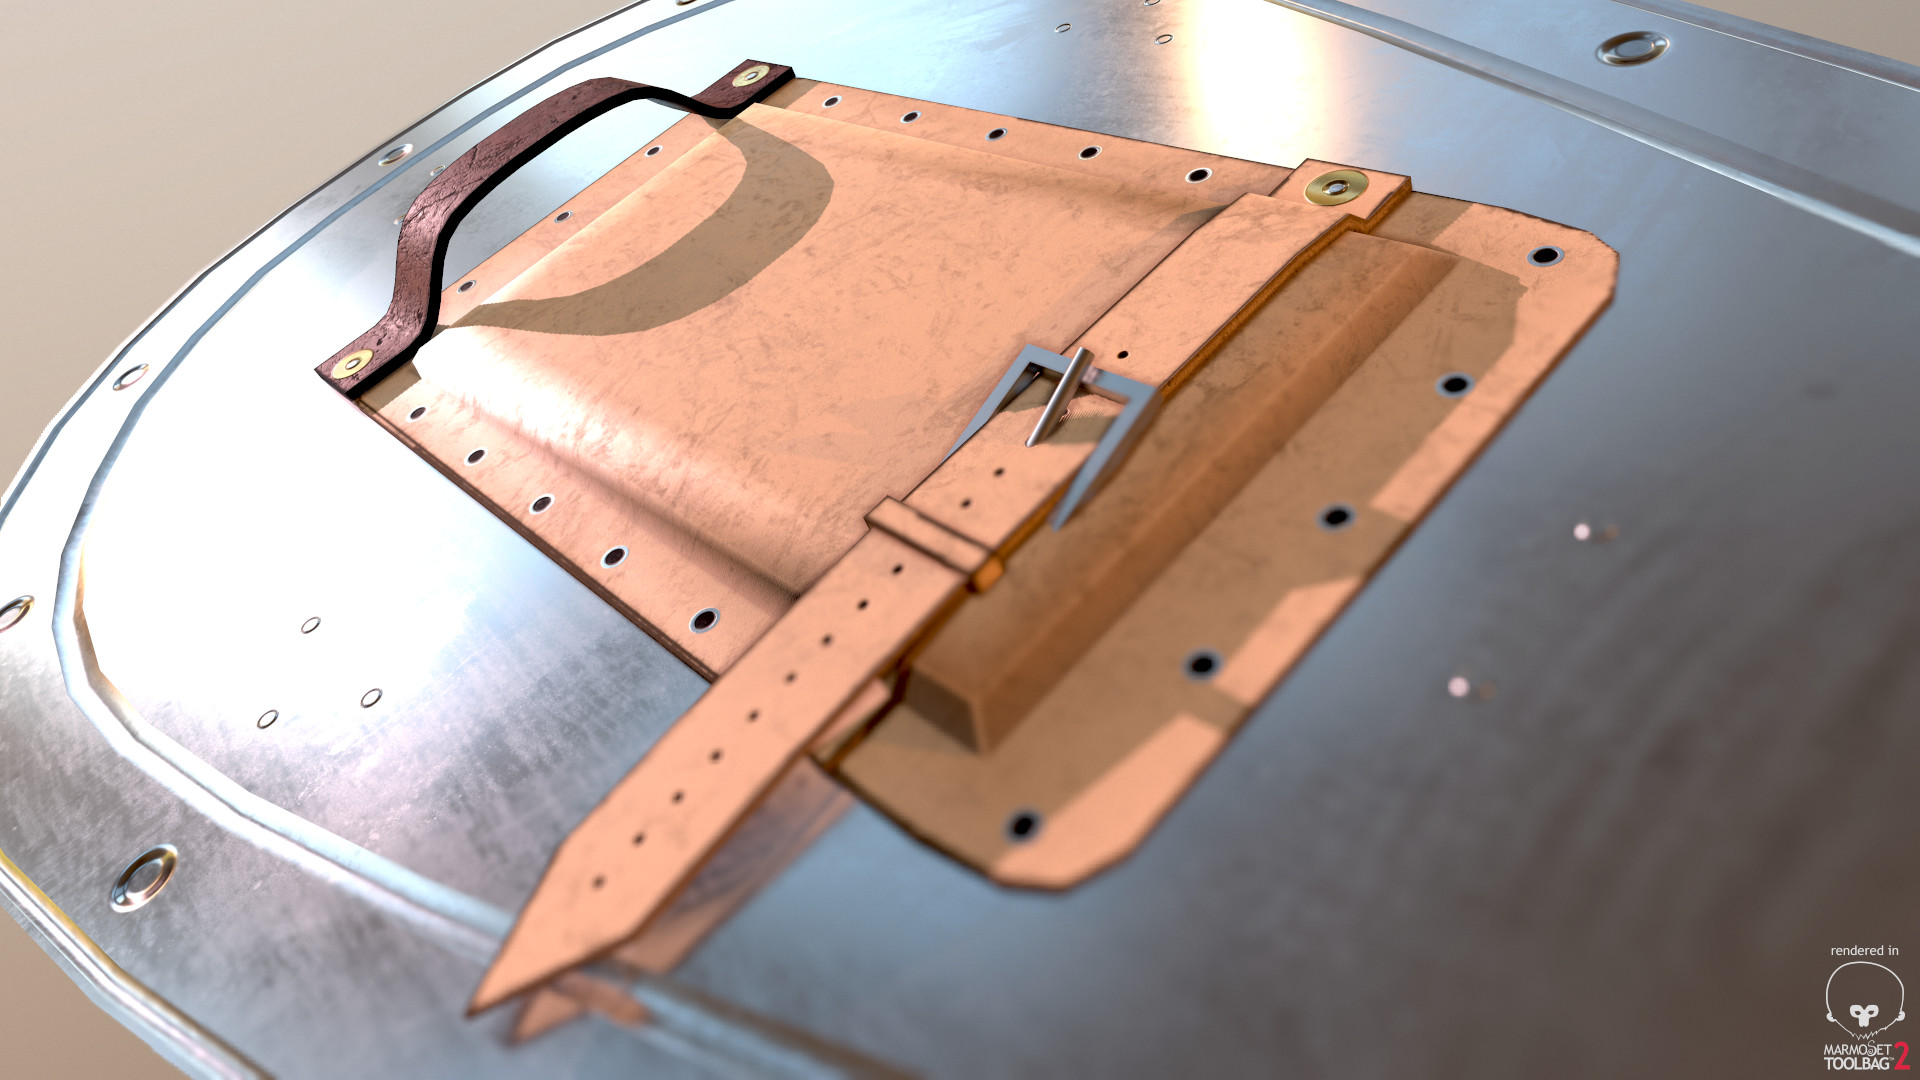 Bela csampai iron norman shield preview mt 03